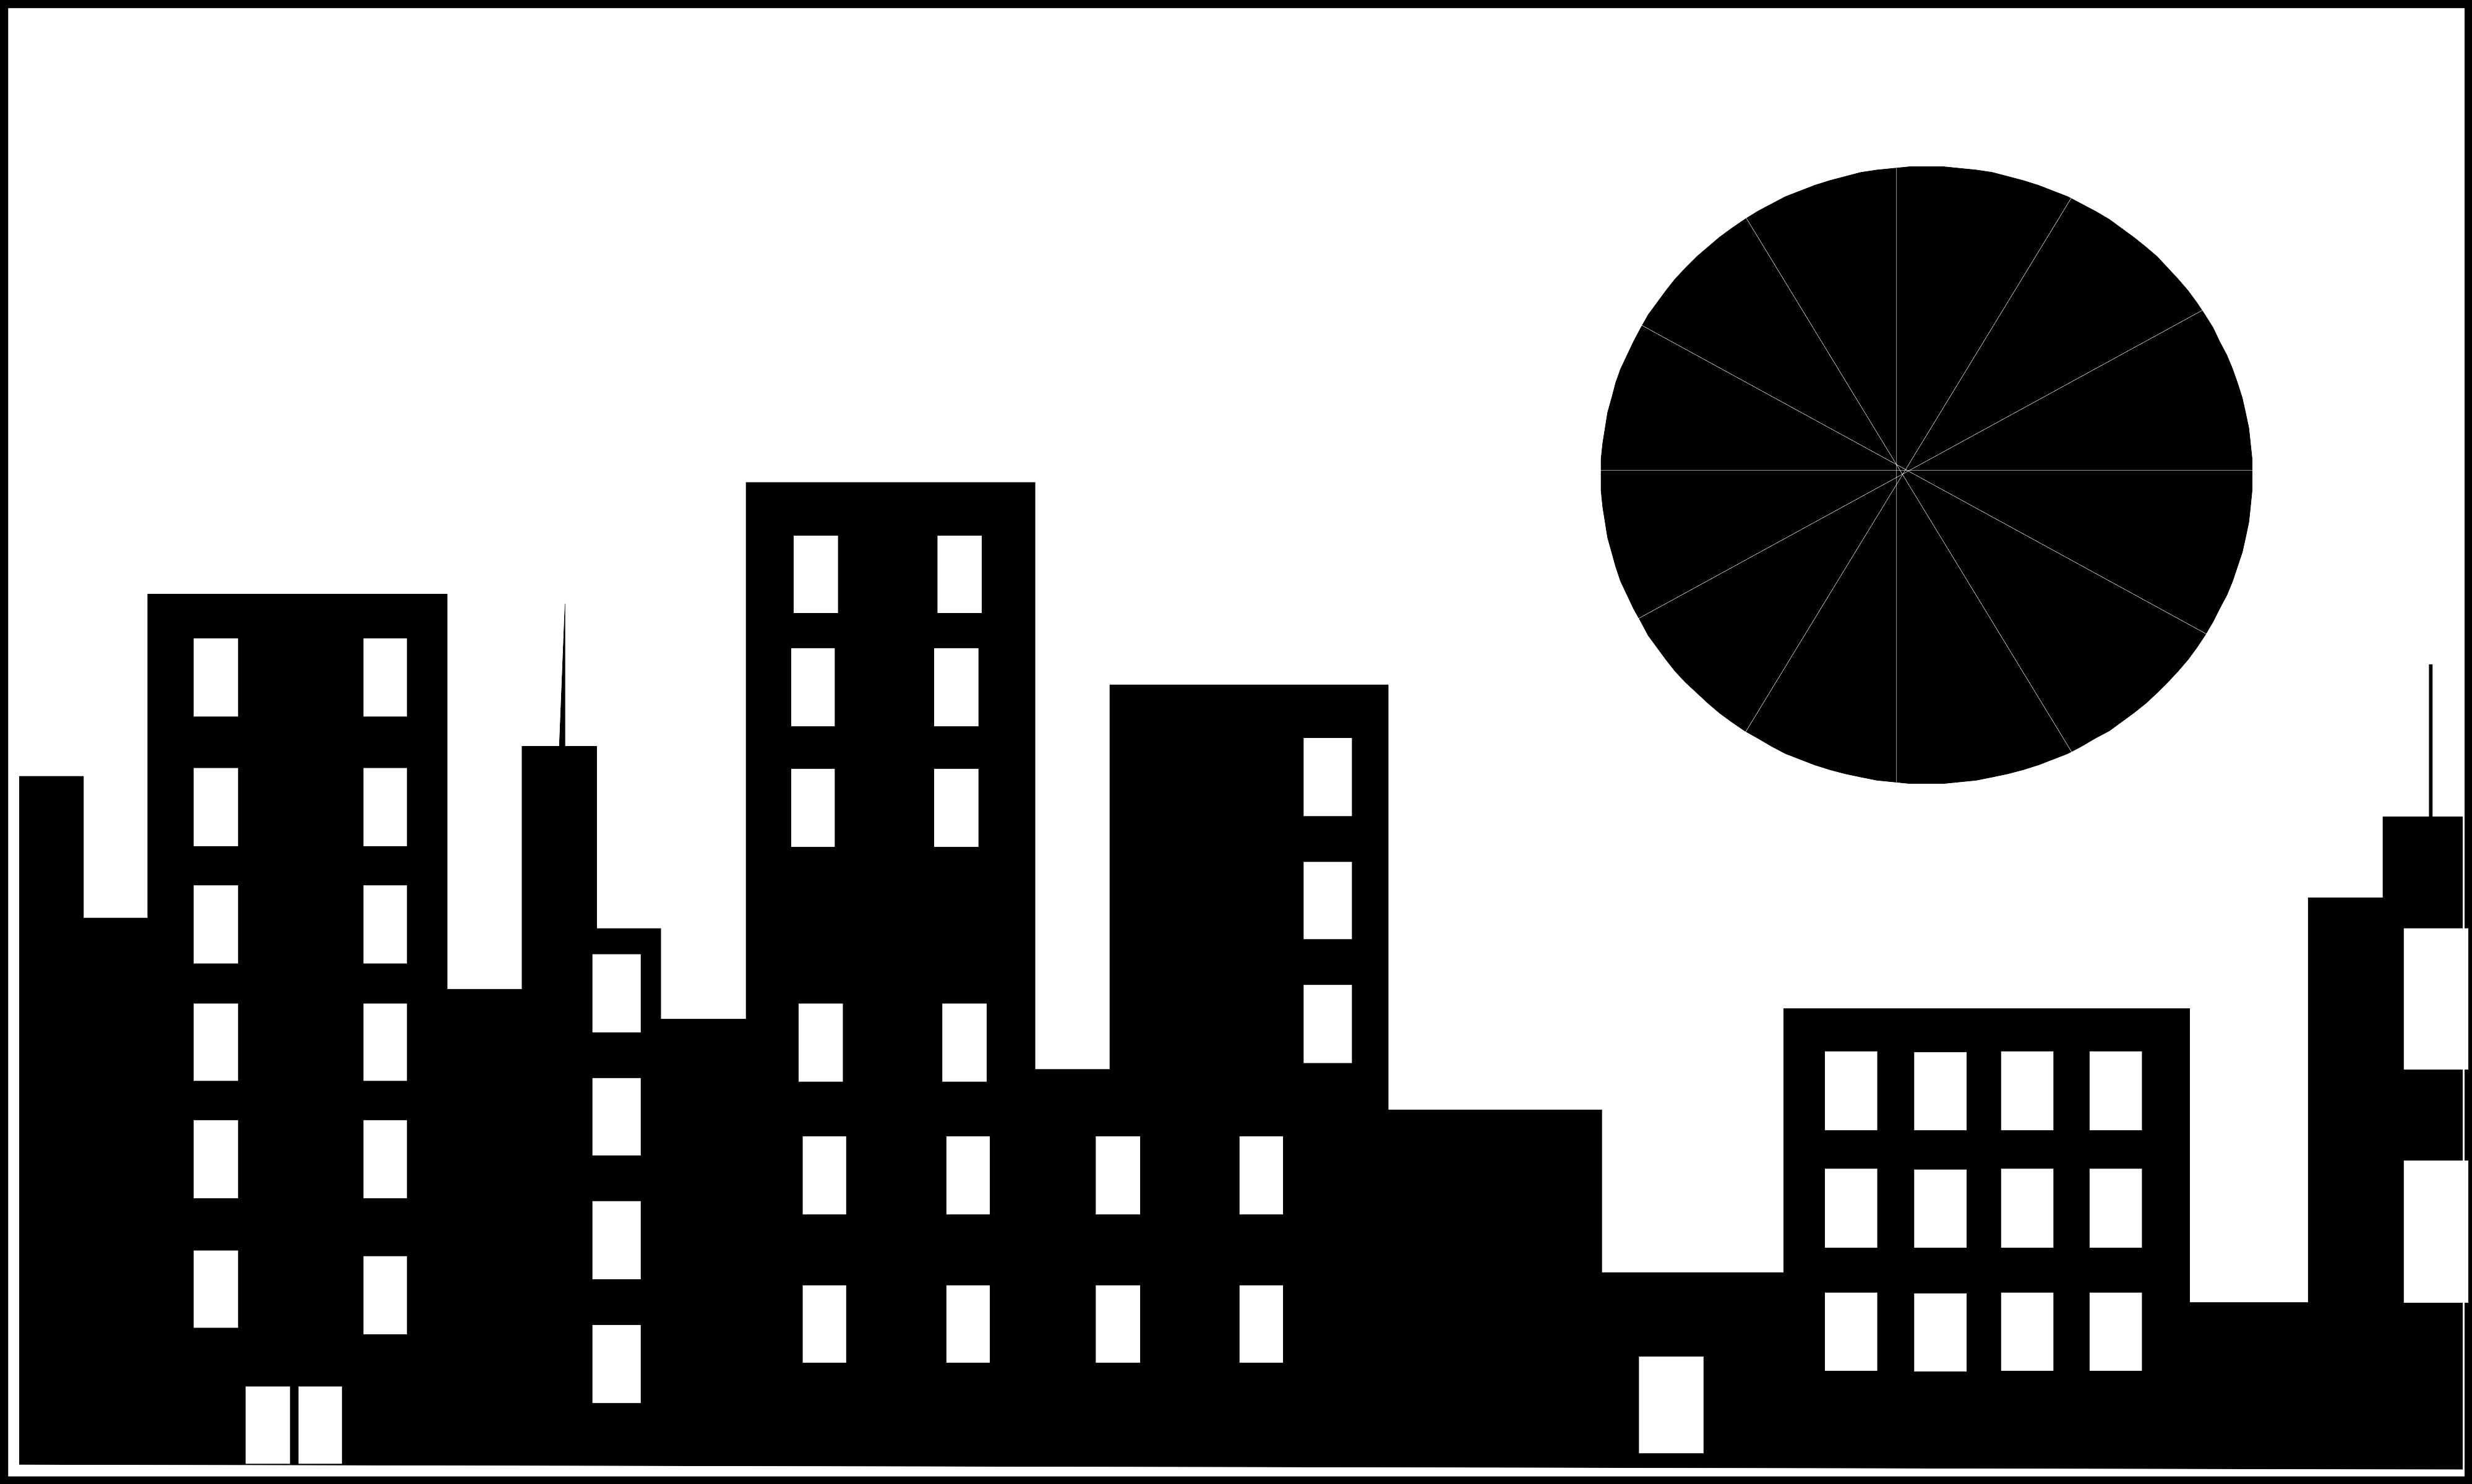 6458 Illustration Of A City Skyline With A Shining Sun Or Png 3996 2399 Skema Warna Gambar Siluet